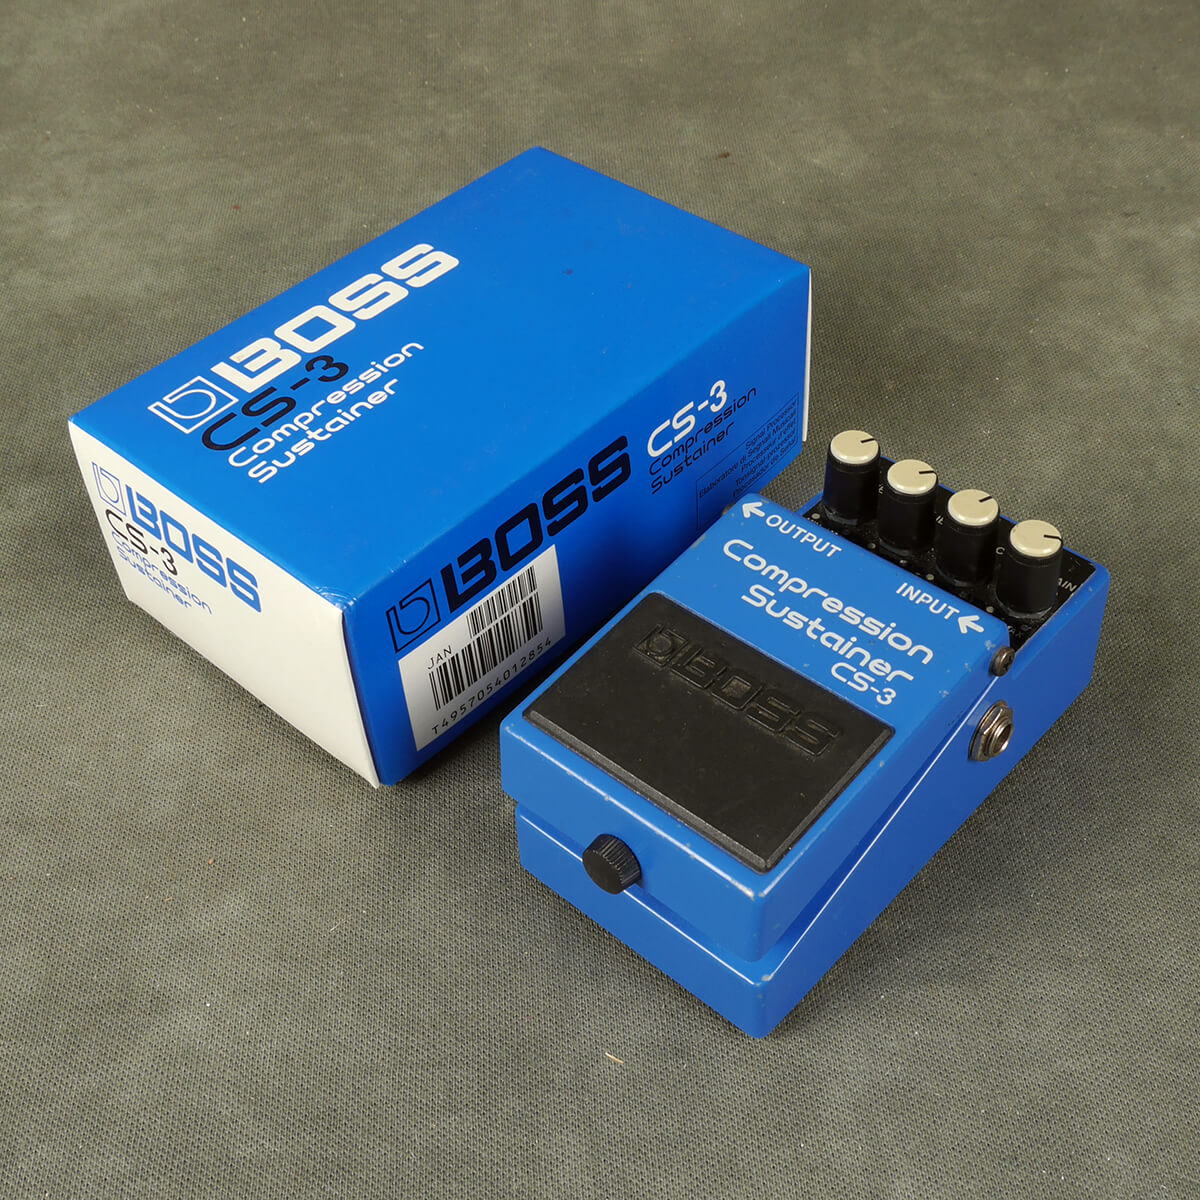 Boss CS-3 Compressor FX Pedal w/Box - 2nd Hand